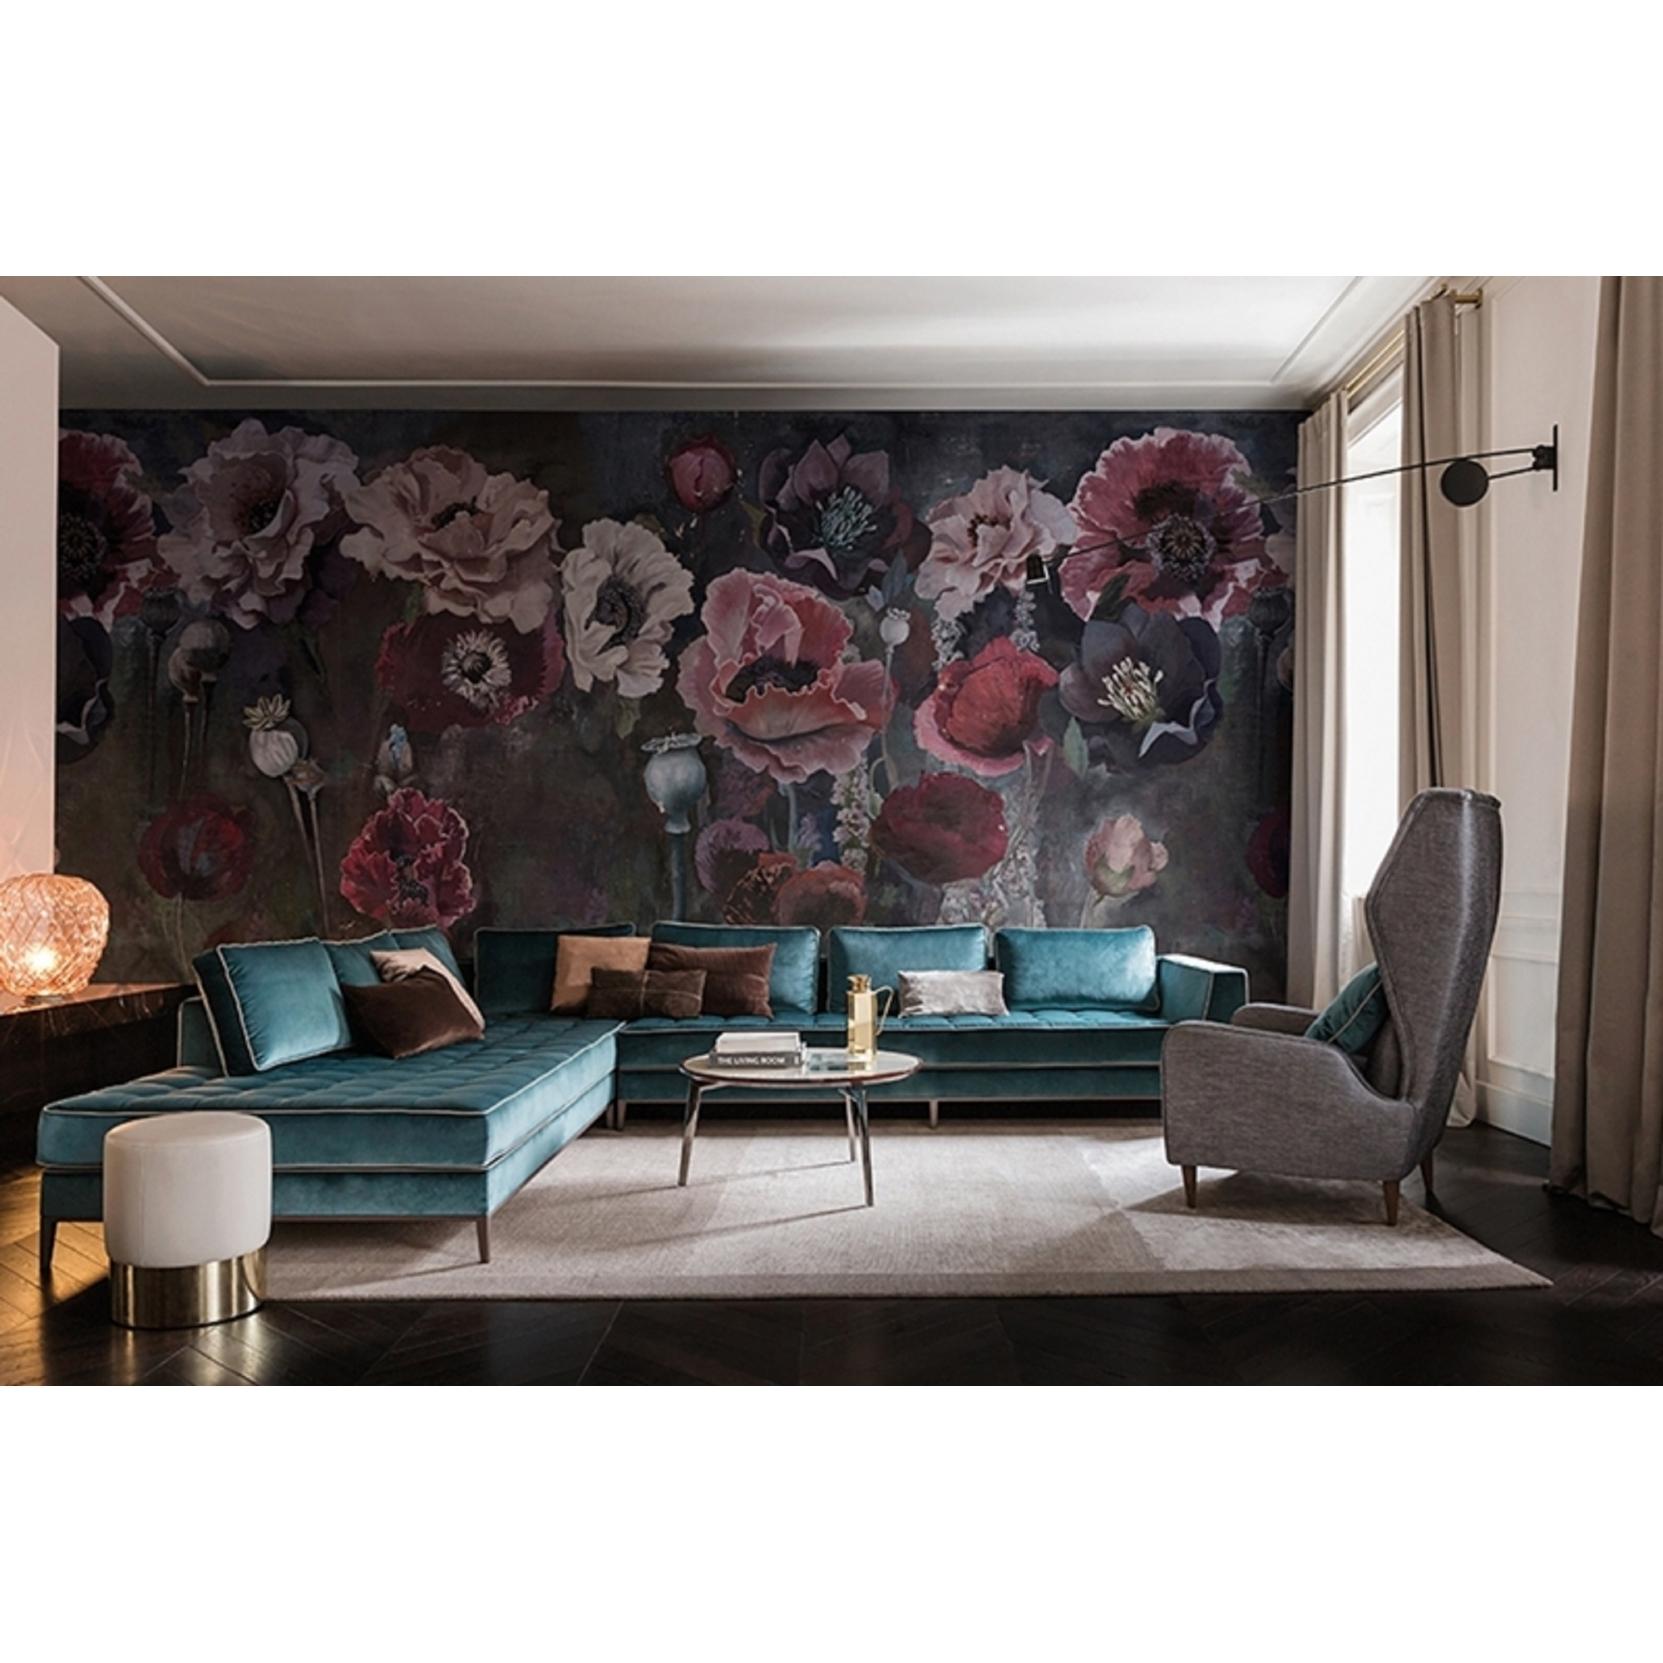 wall dec pavot wallpaper tattahome. Black Bedroom Furniture Sets. Home Design Ideas